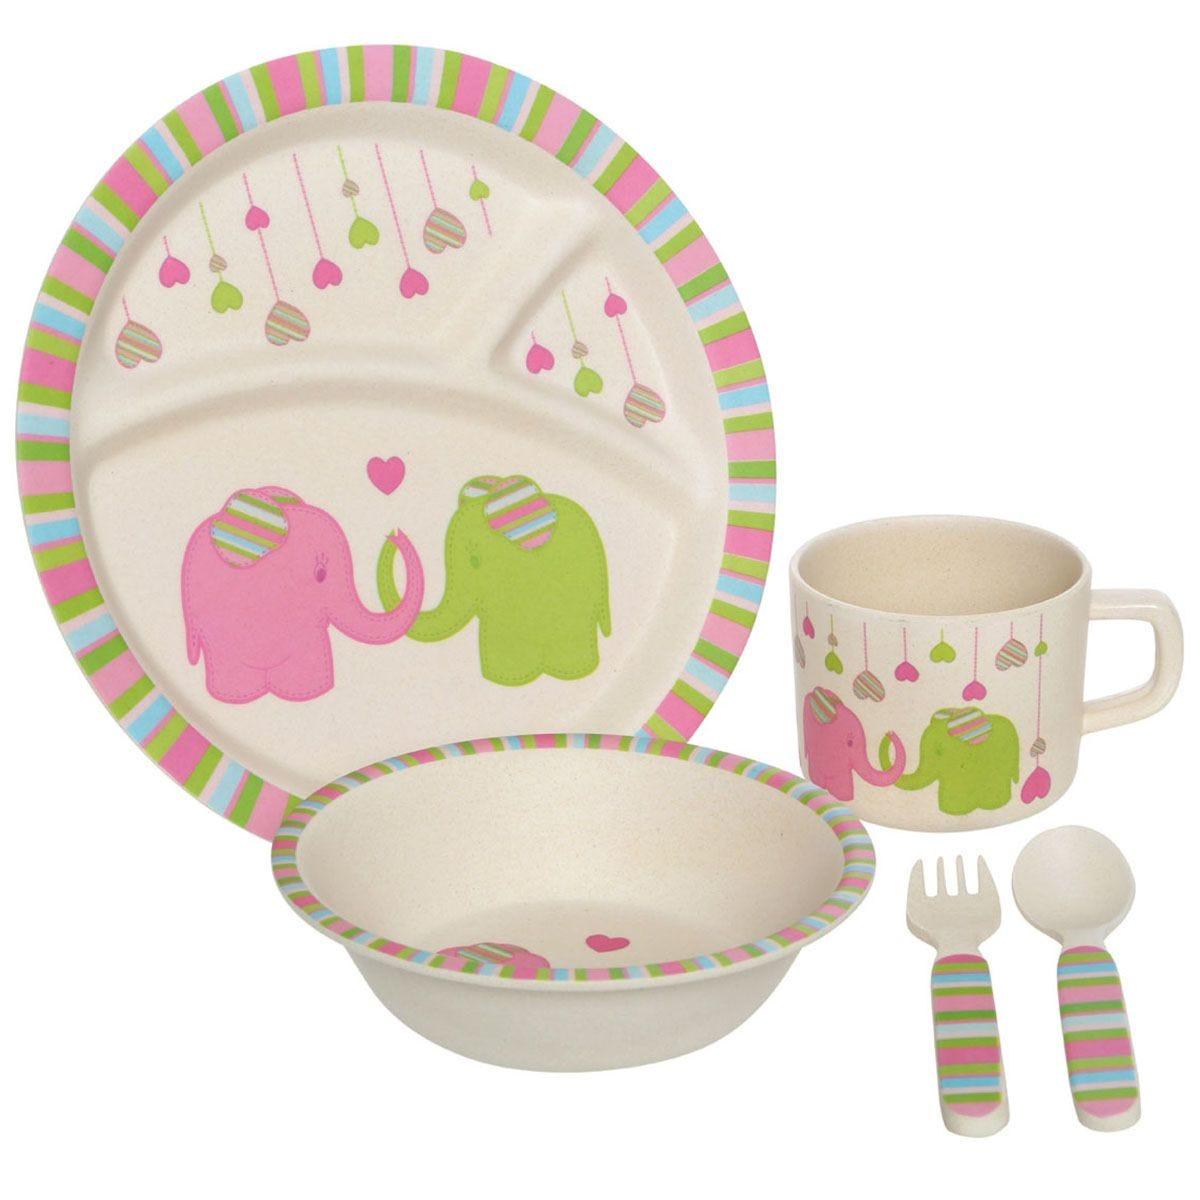 Premier Housewares 5-Piece Eden Elephant Kids Dinner Set